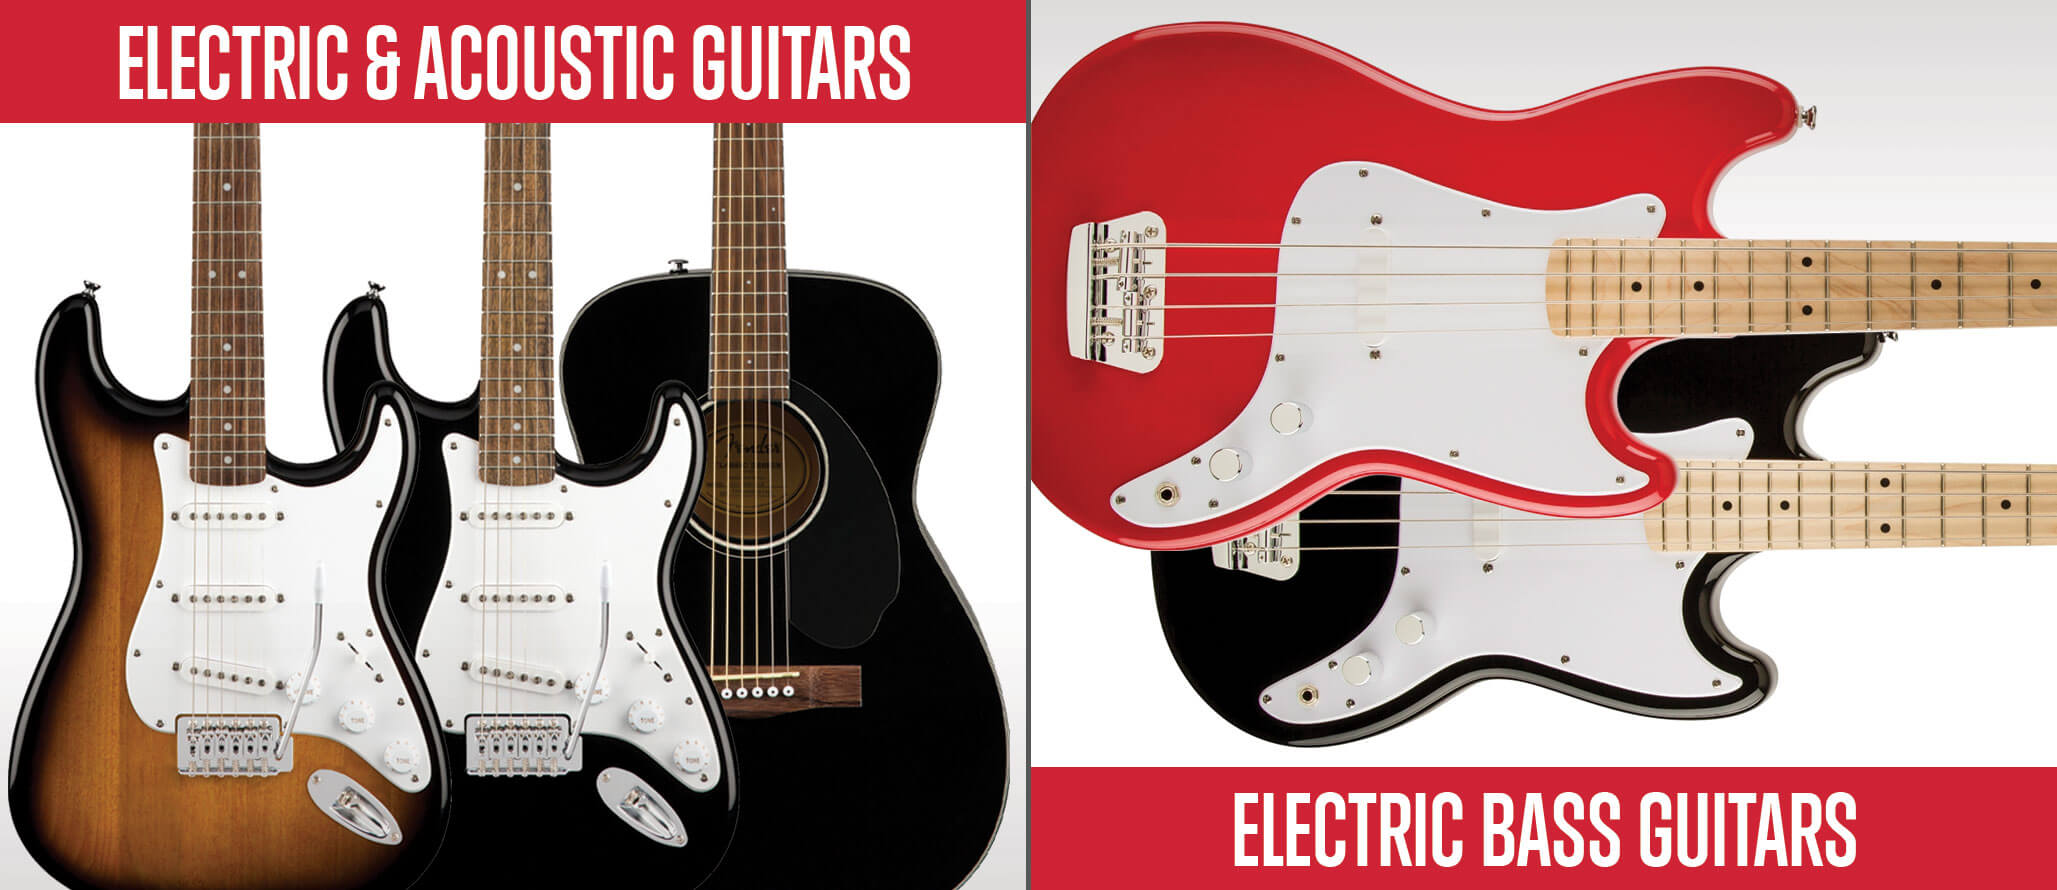 School of Rock sells electric guitars, acoustic guitars and bass guitars